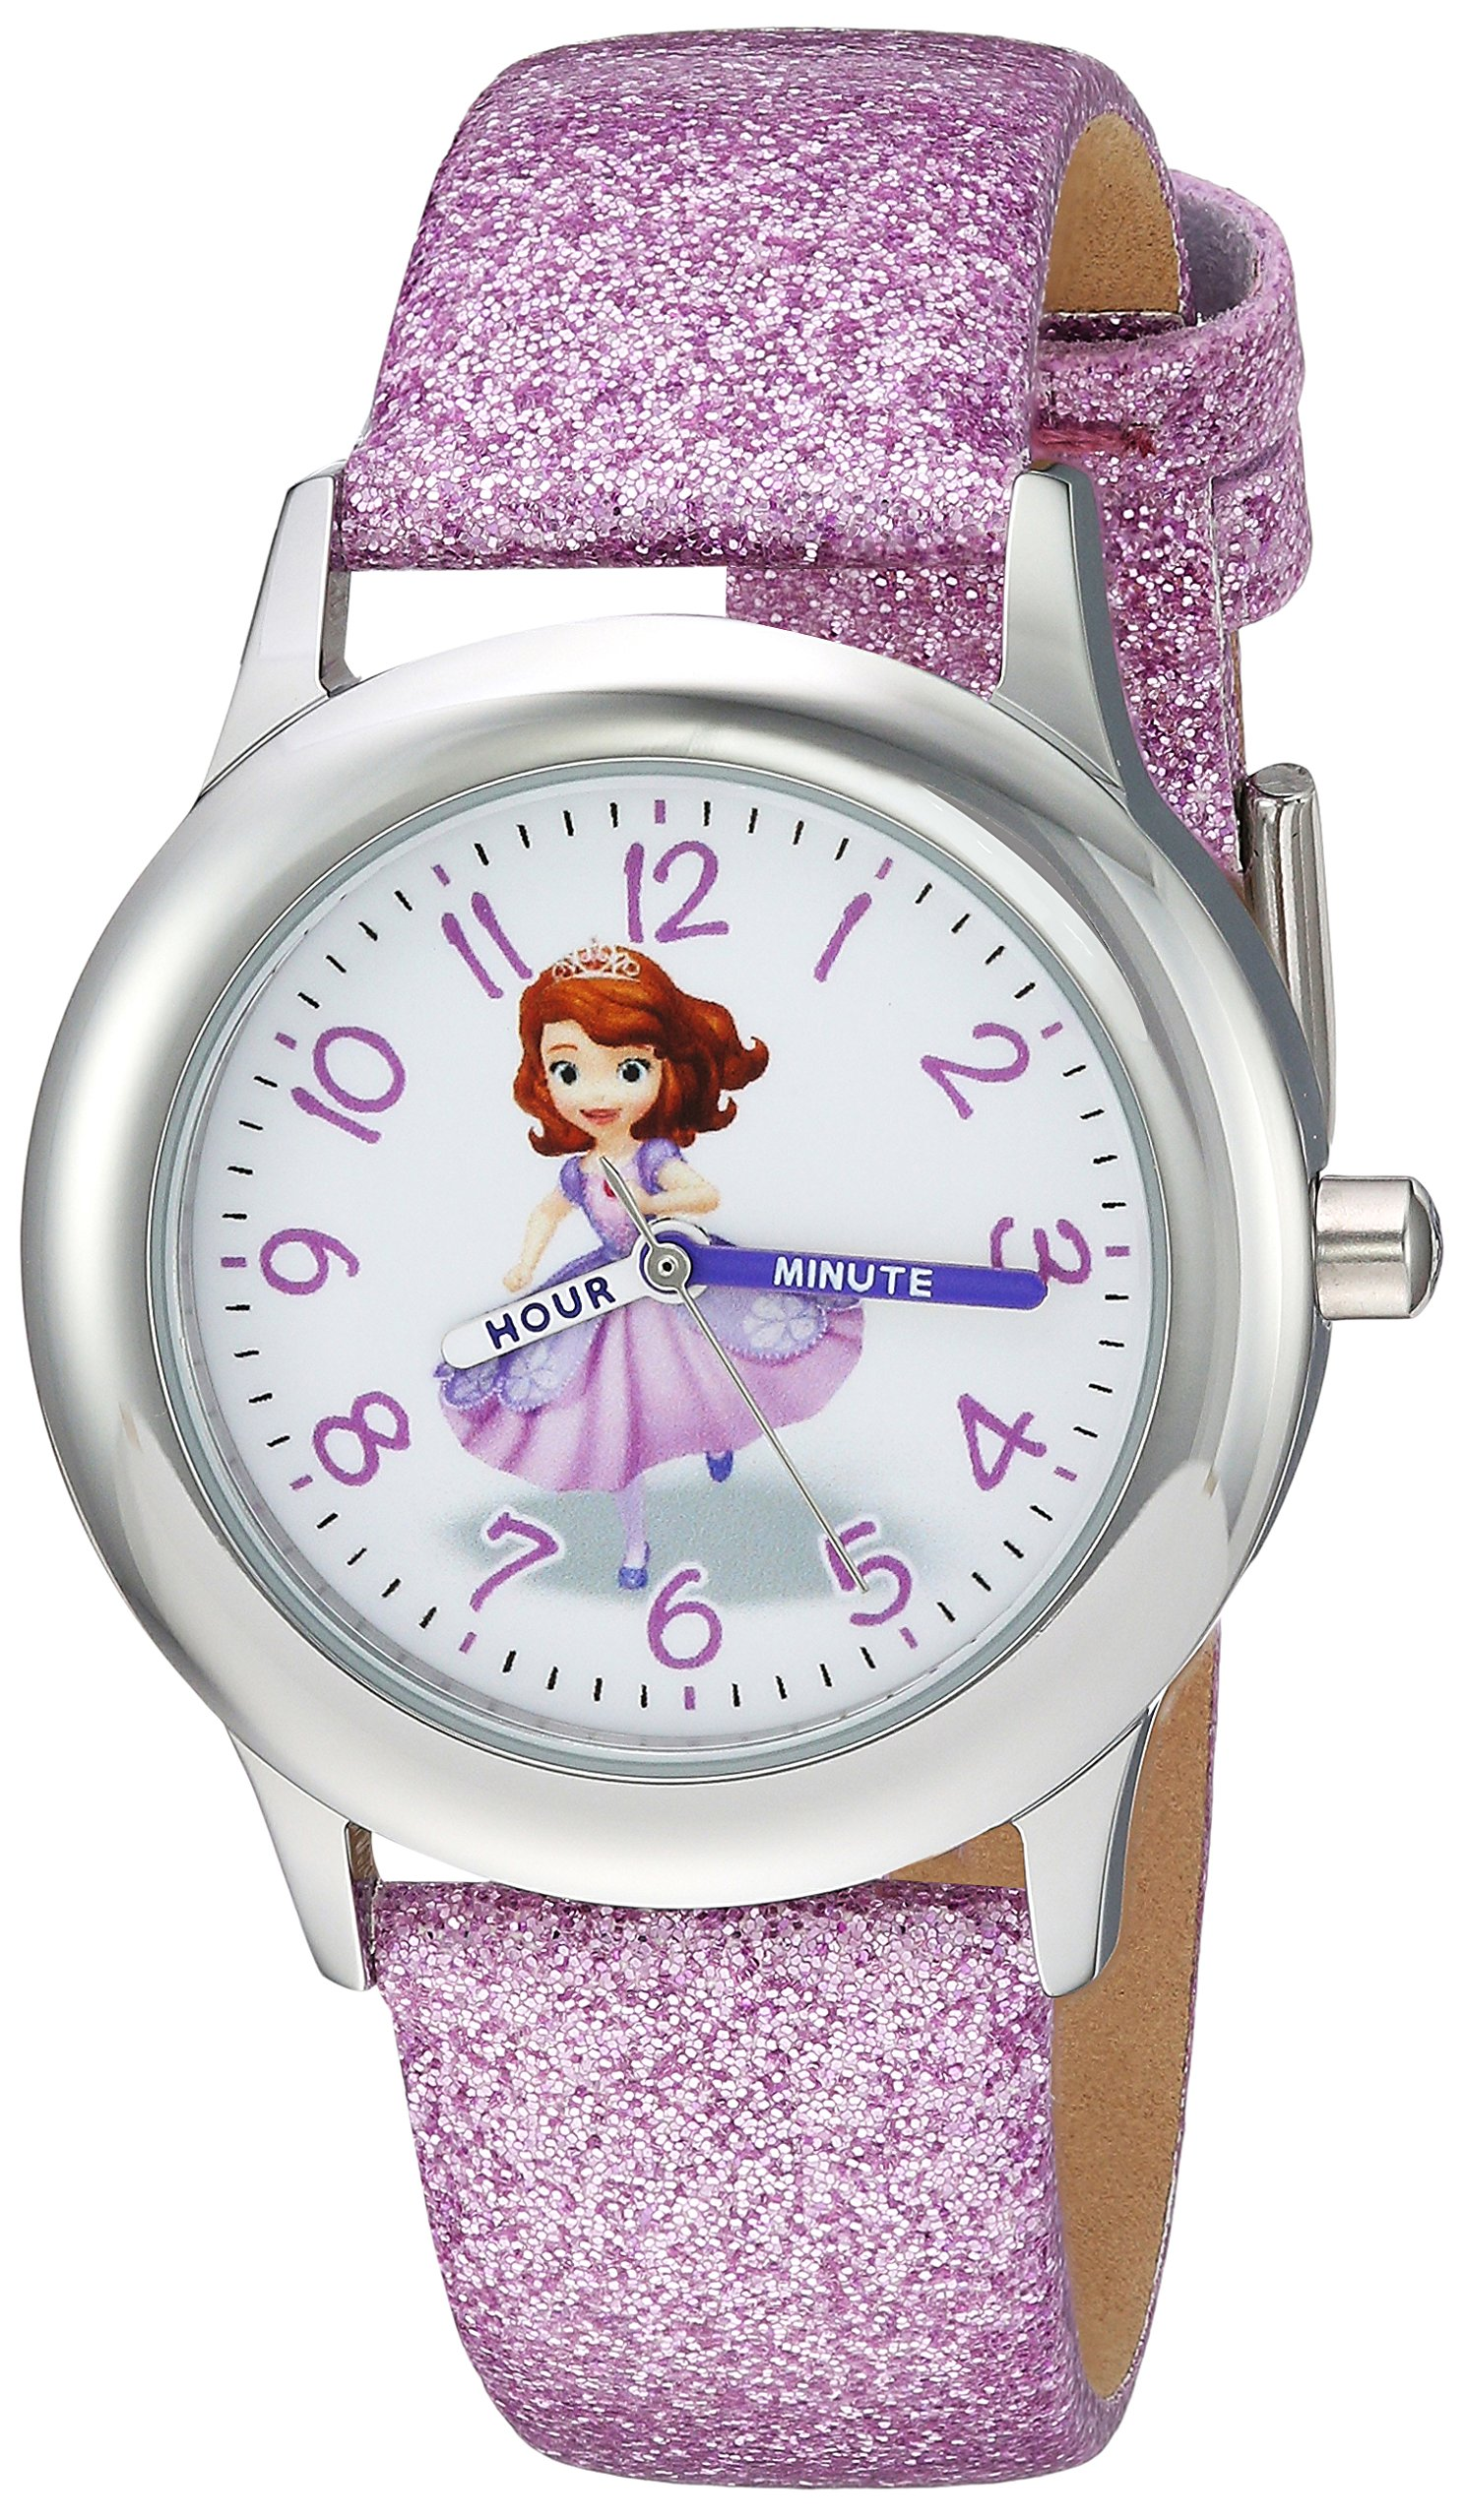 DISNEY Girls Princess Sofia Stainless Steel Analog-Quartz Watch with Leather-Synthetic Strap, Purple, 15 (Model: WDS000269) by Disney